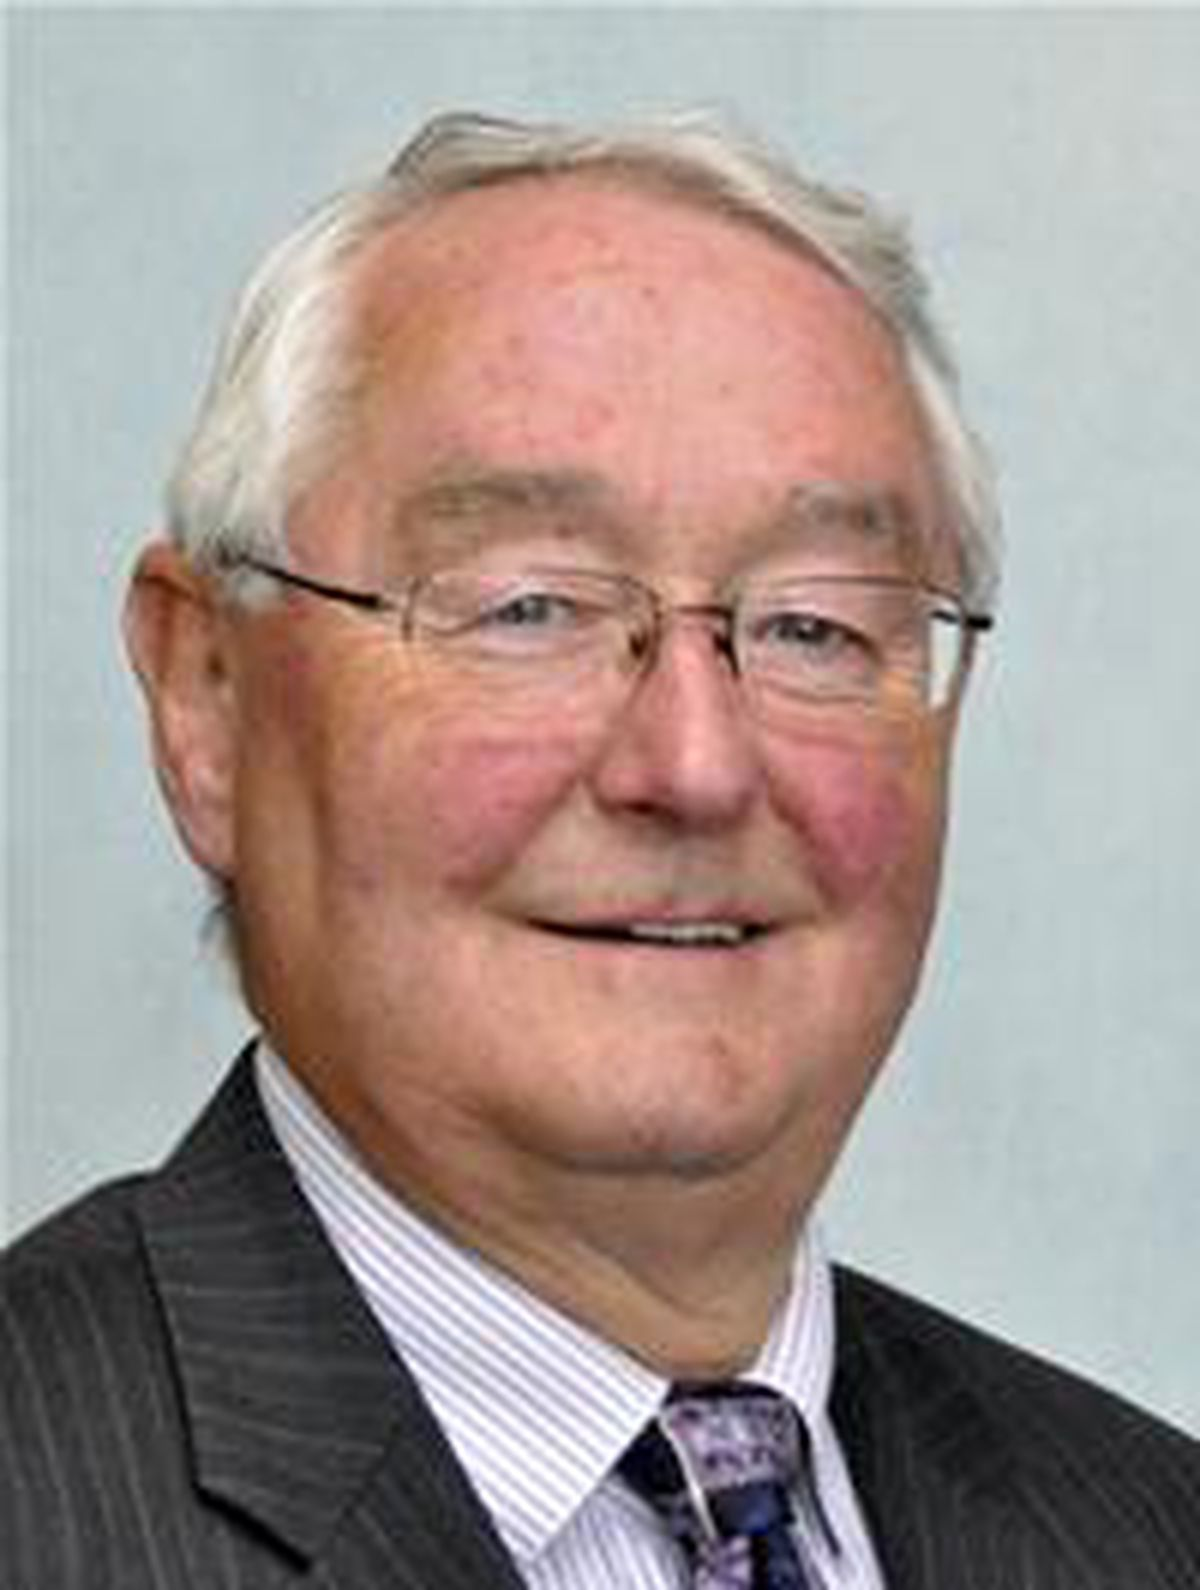 Councillor Roger Evans